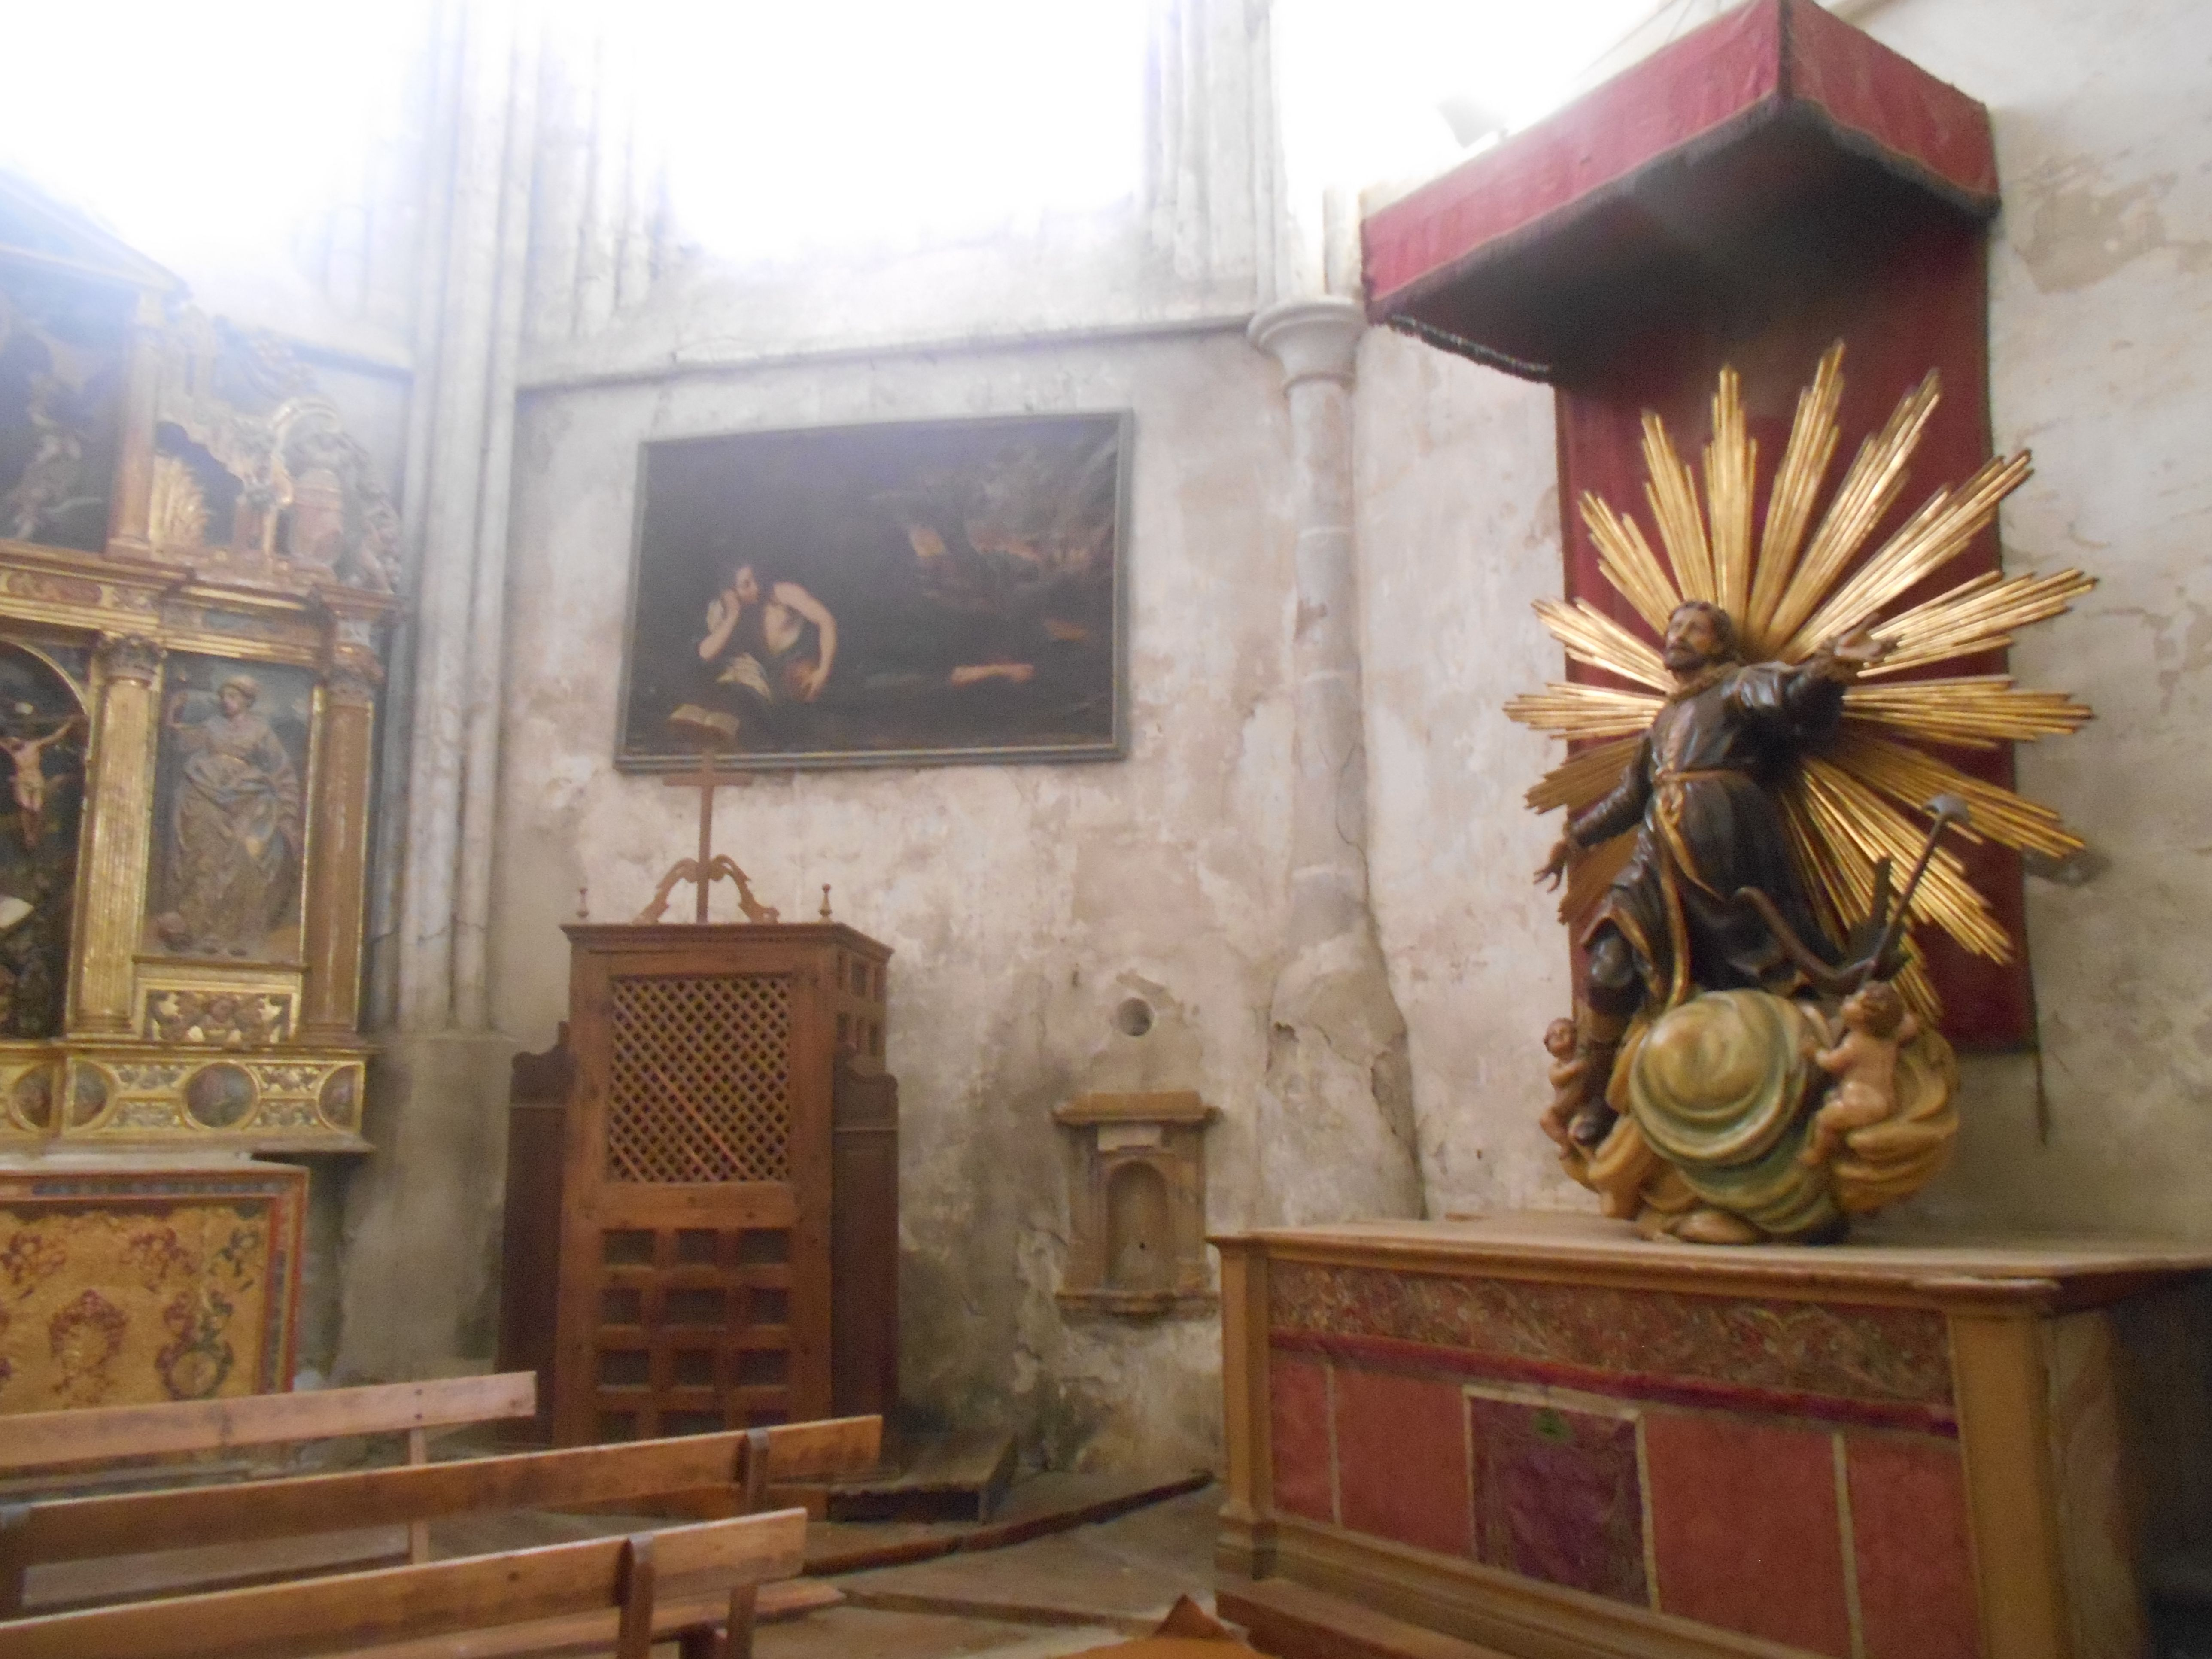 Pintura con toques tenebrístas y escultura de San Isidro. capilla de San Isidro o de San Jerónimo